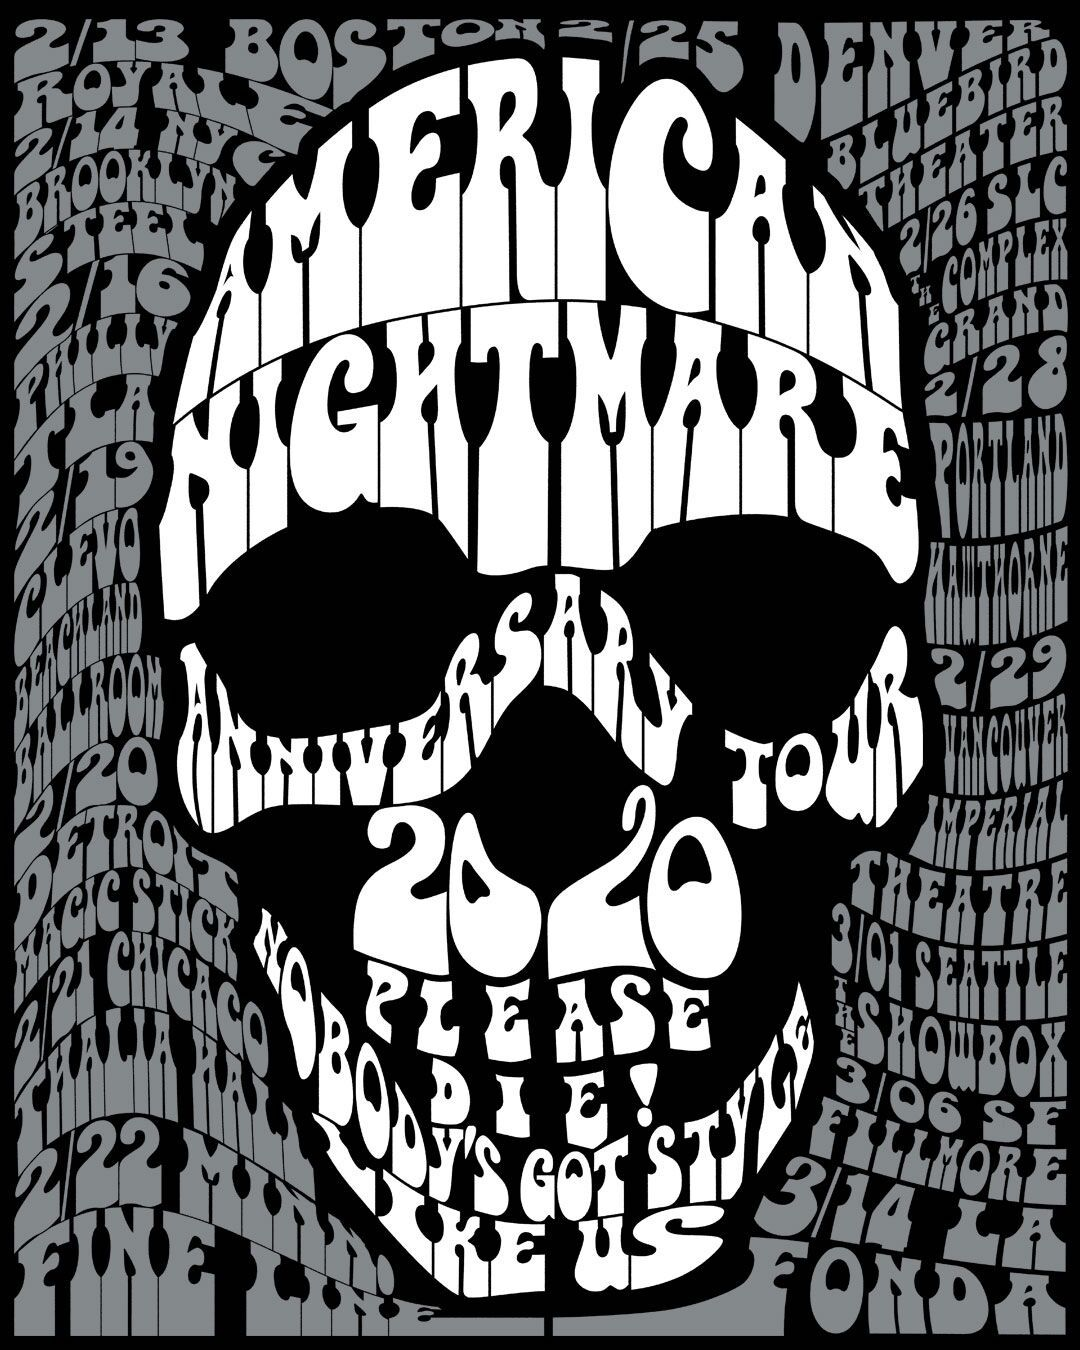 American Nightmare 20th anniversary poster